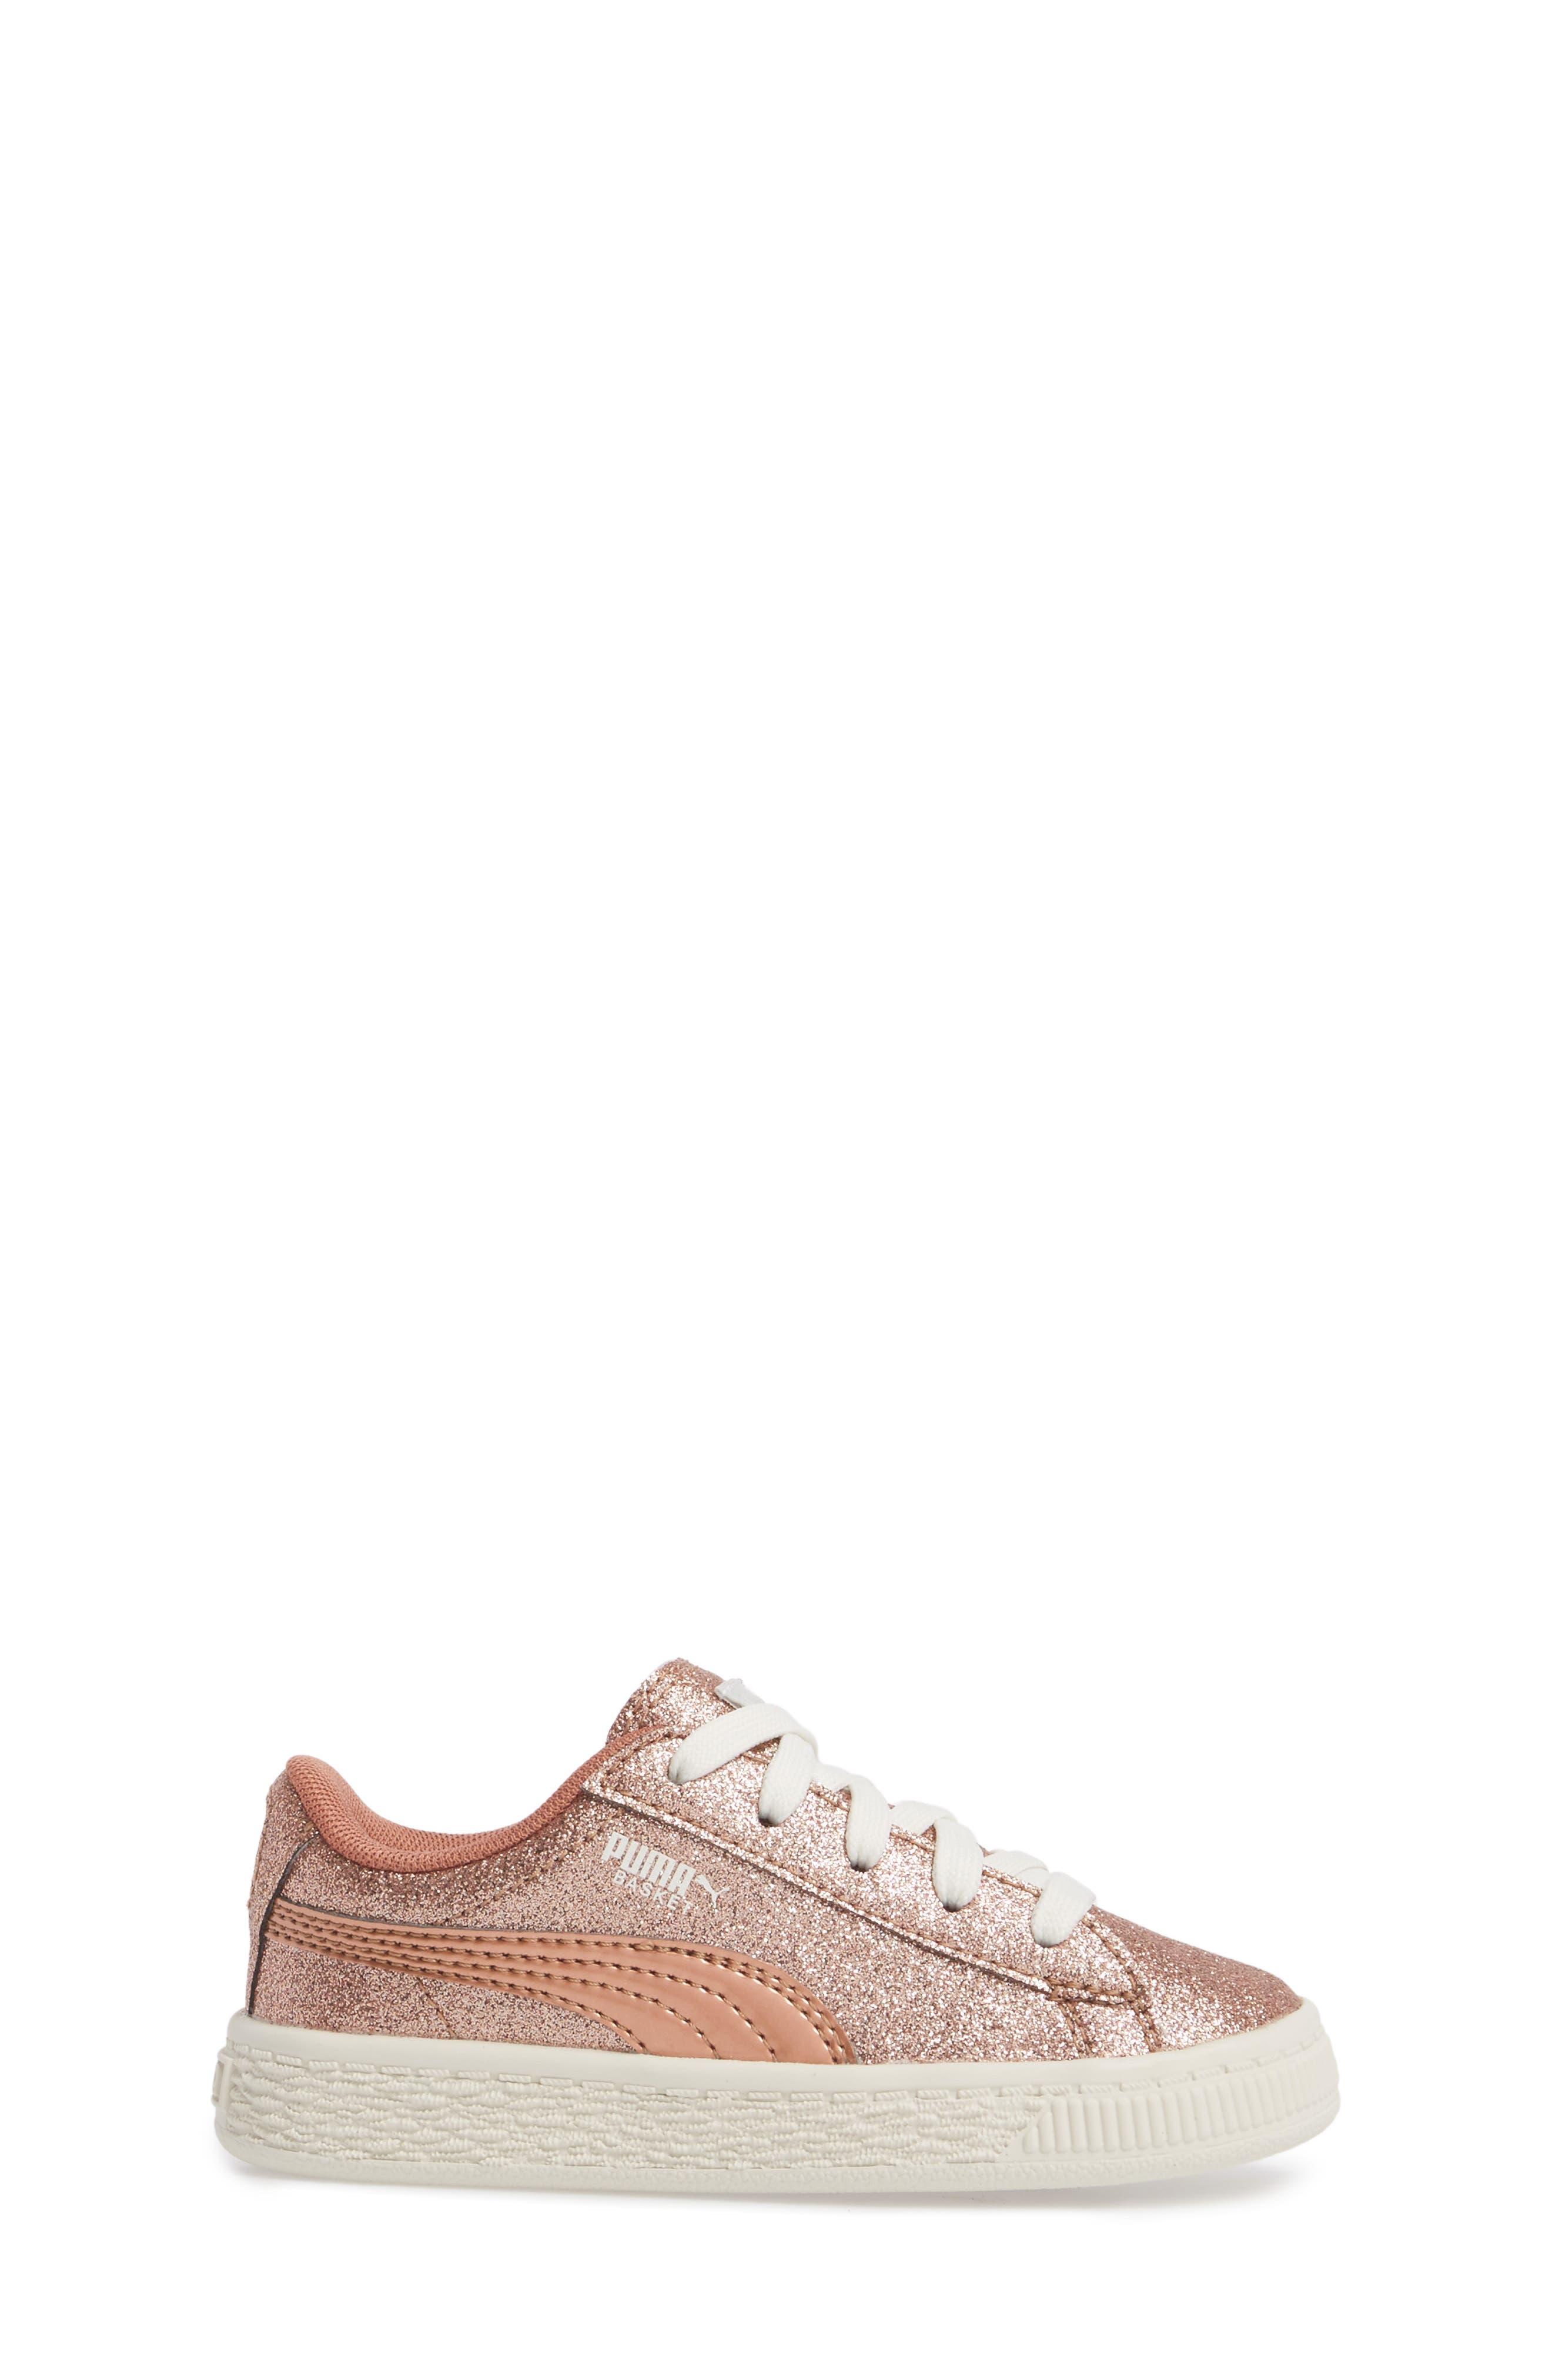 Basket Holiday Glitz Jr. Sneaker,                             Alternate thumbnail 3, color,                             Copper Rose